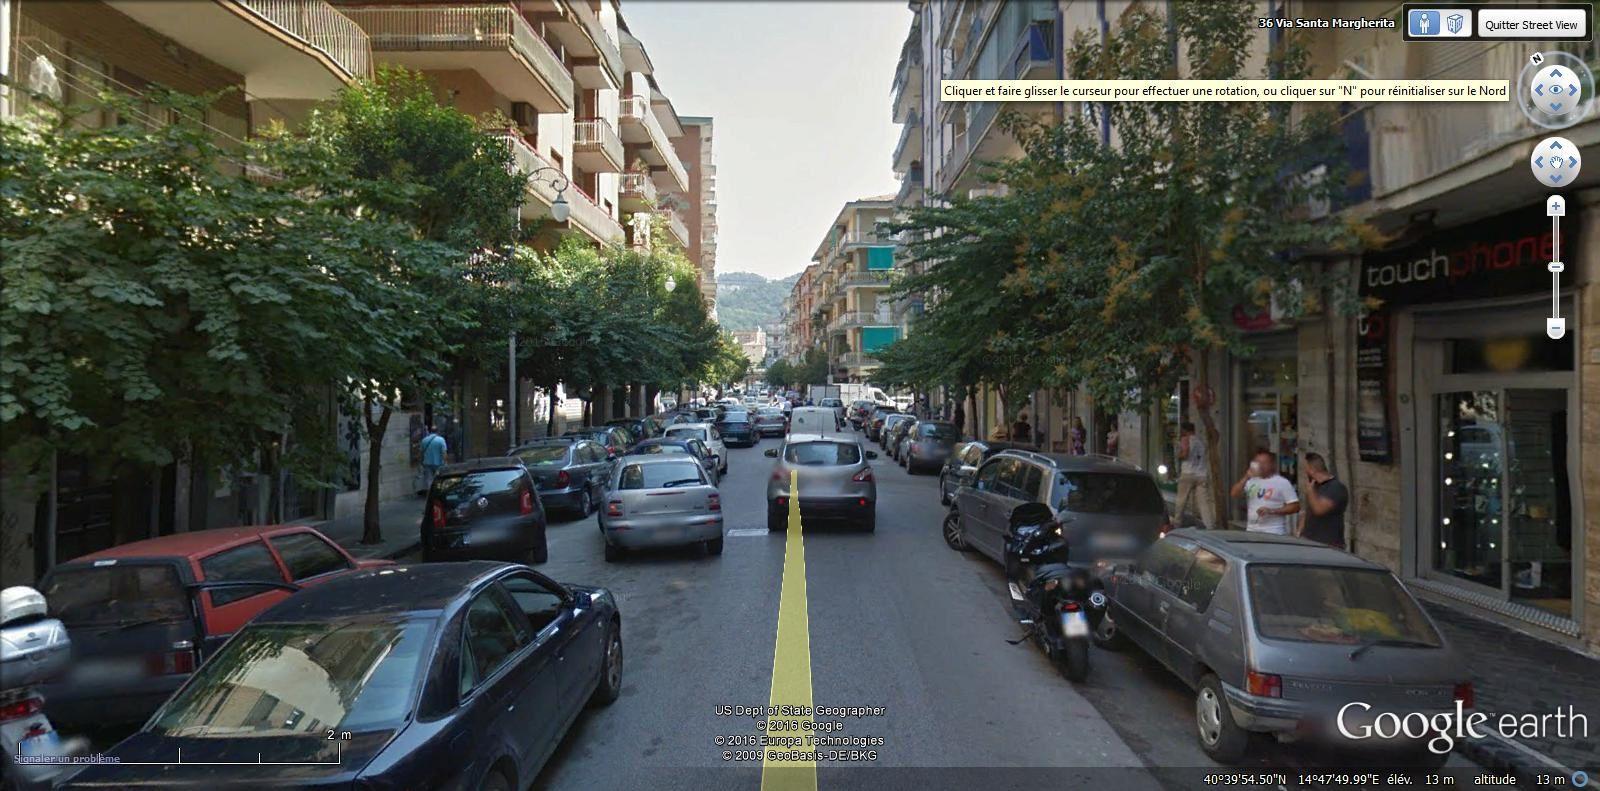 via Santa Margherita